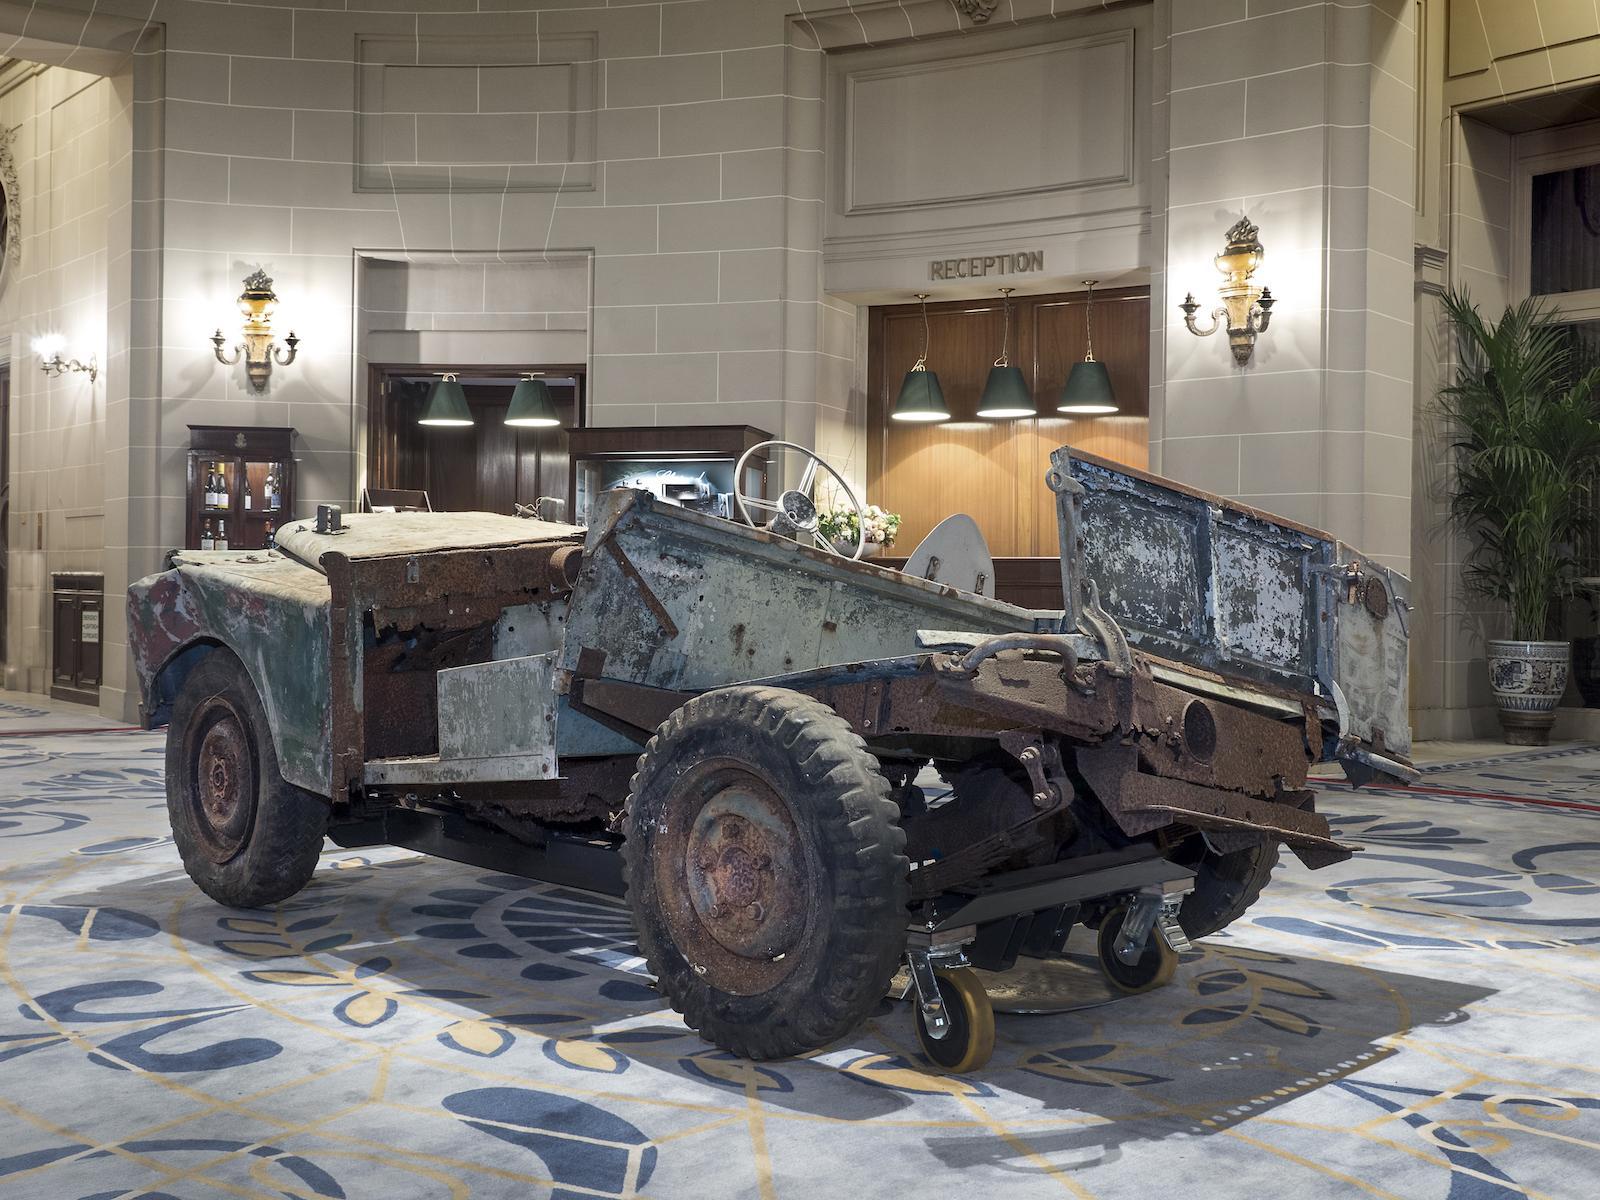 Land-Rover-chasis-860001-1.jpg